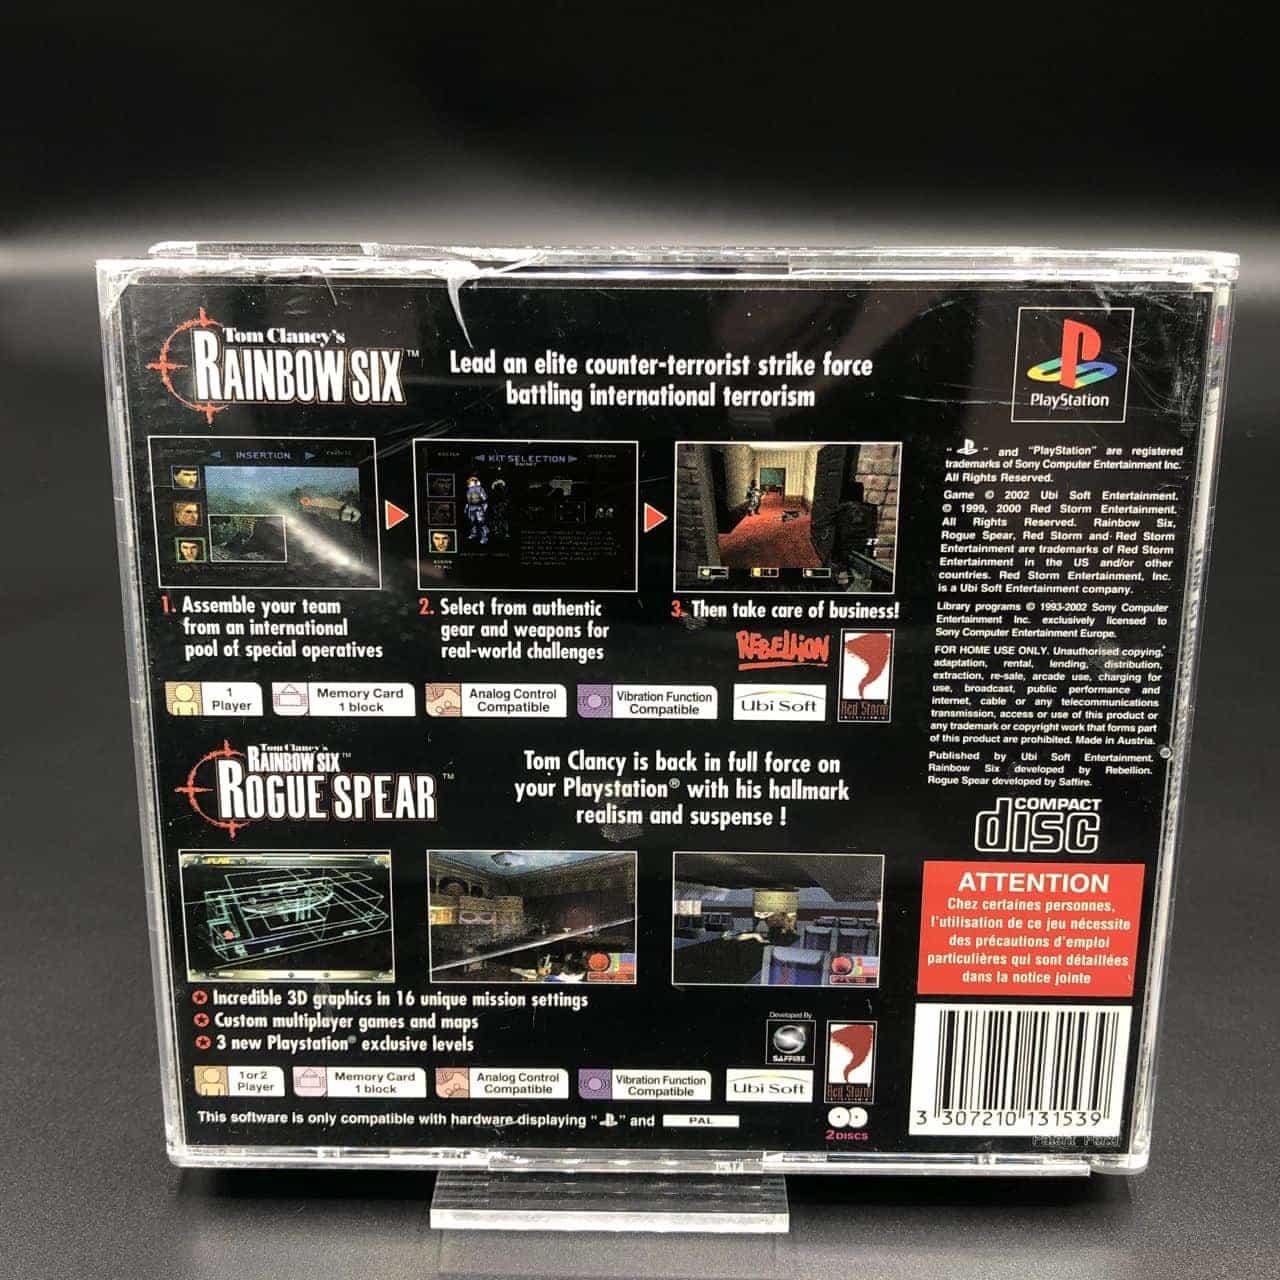 PS1 Tom Clancy's: Rainbow Six + Rogue Spear (2 Games) (Komplett) (Sehr gut) Sony PlayStation 1